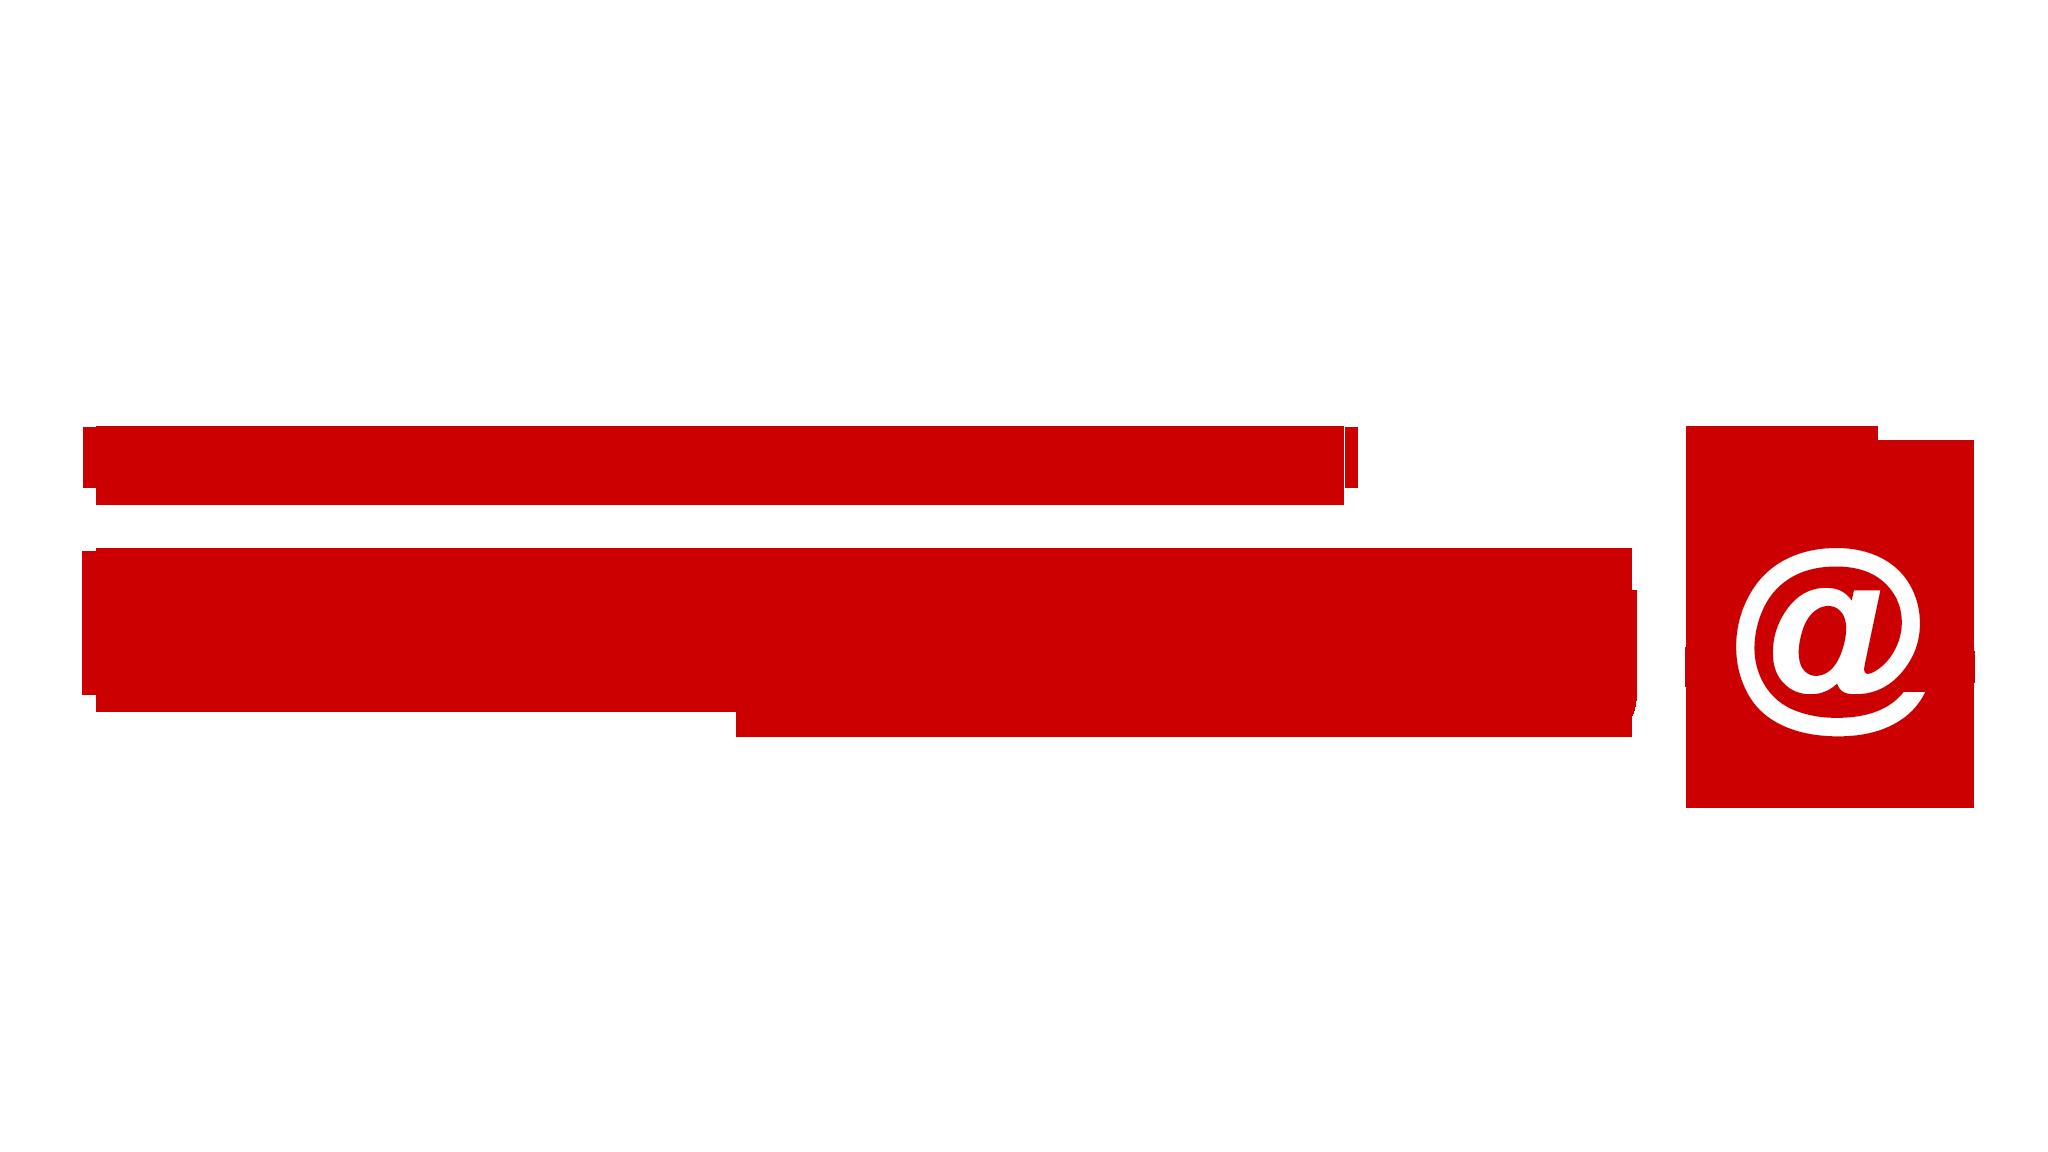 krwiodawcy.org